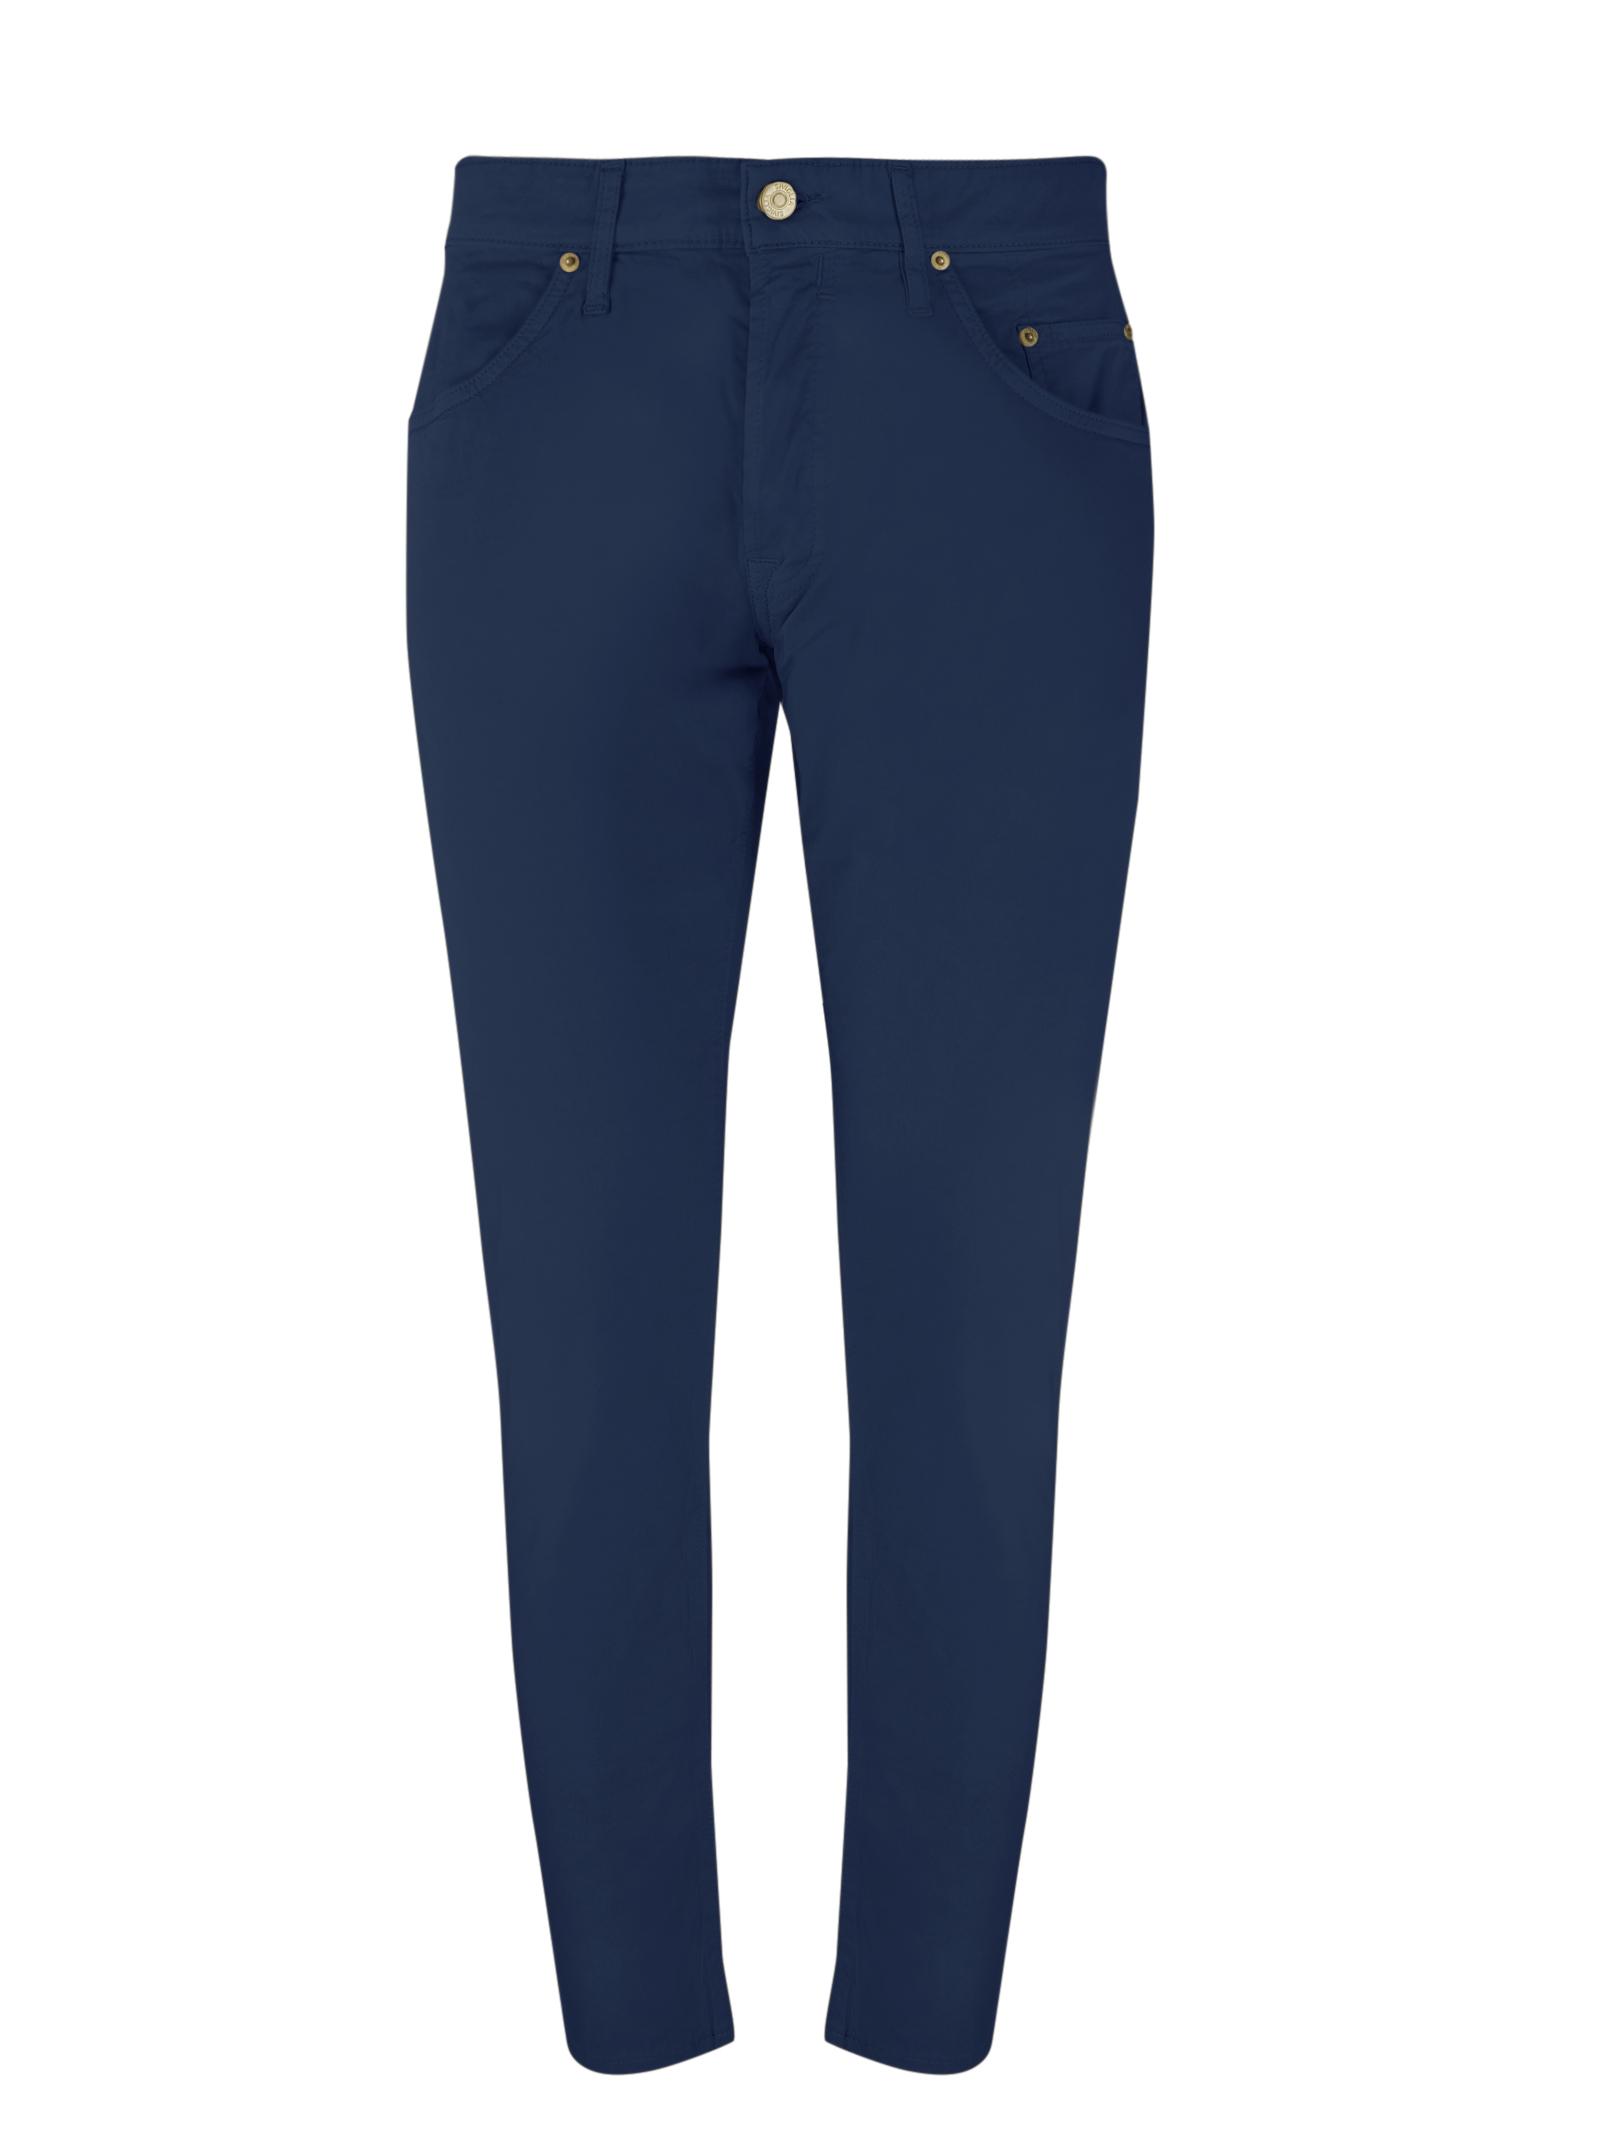 5 pocket light cotton pants,button fly SIVIGLIA | Trousers | MQ2002 80230705